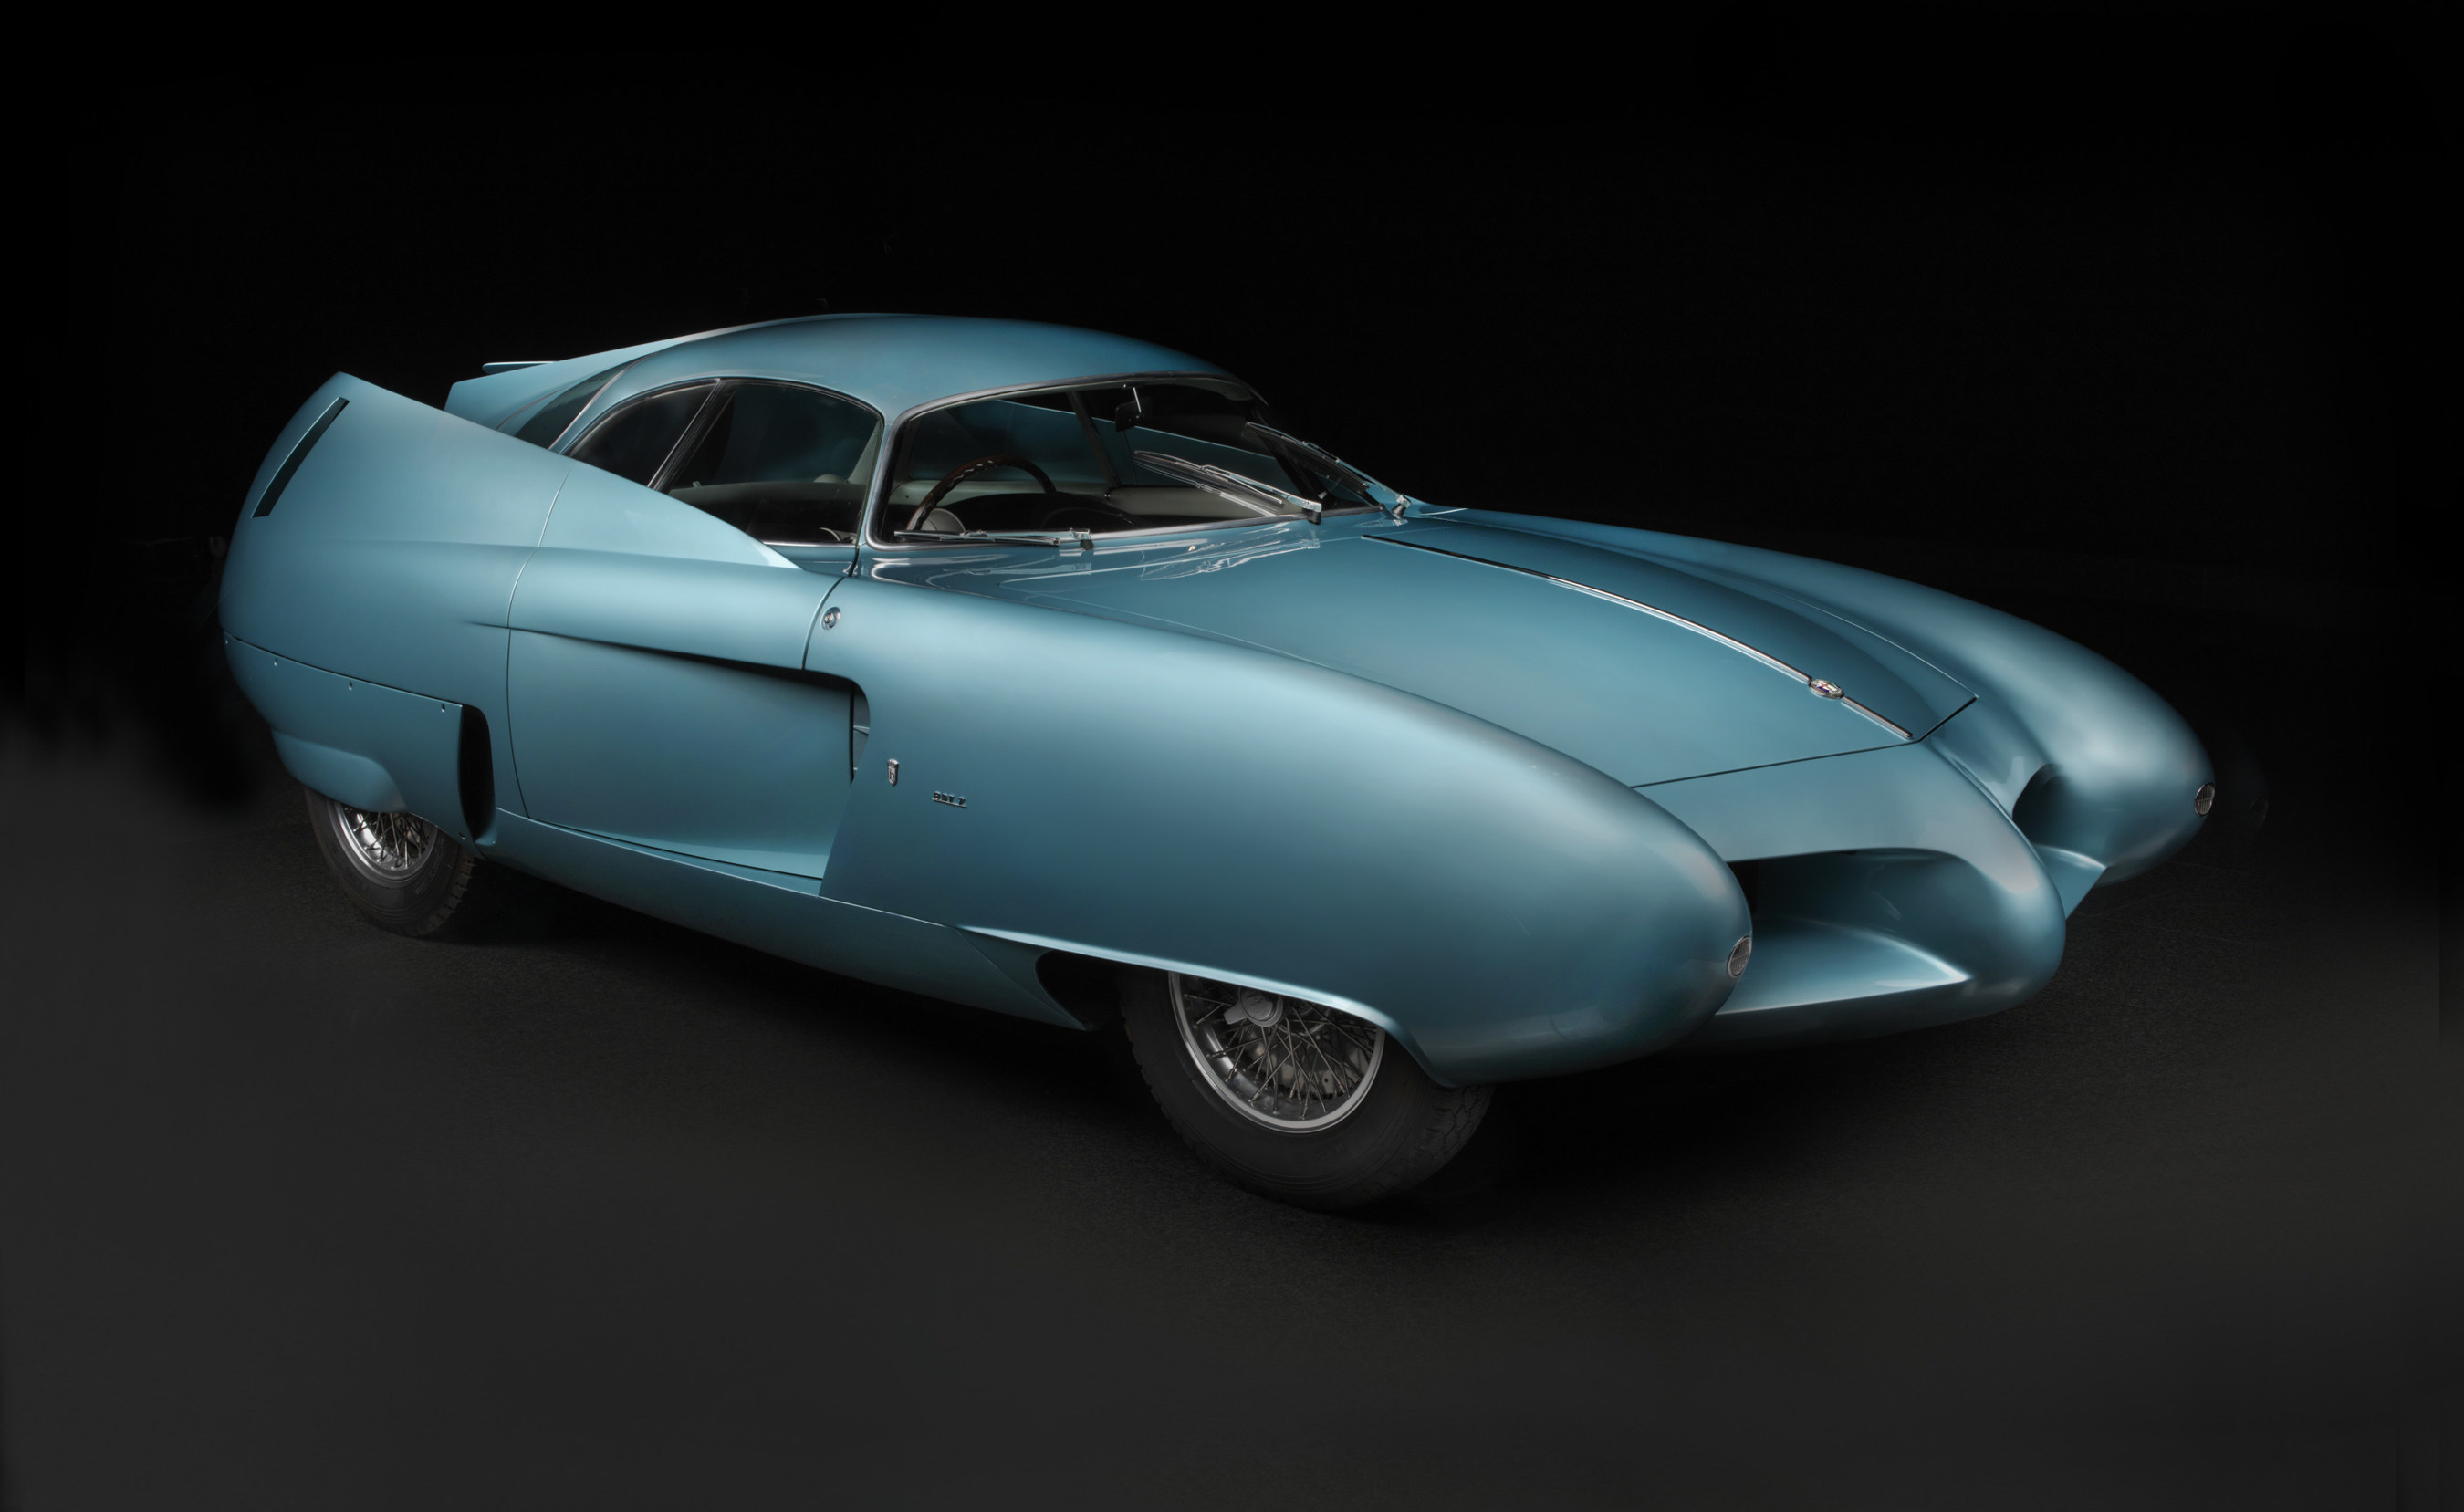 1954 Alfa Romeo BAT 7. The Blackhawk Collection. Image (C) 2016 Peter Harholdt